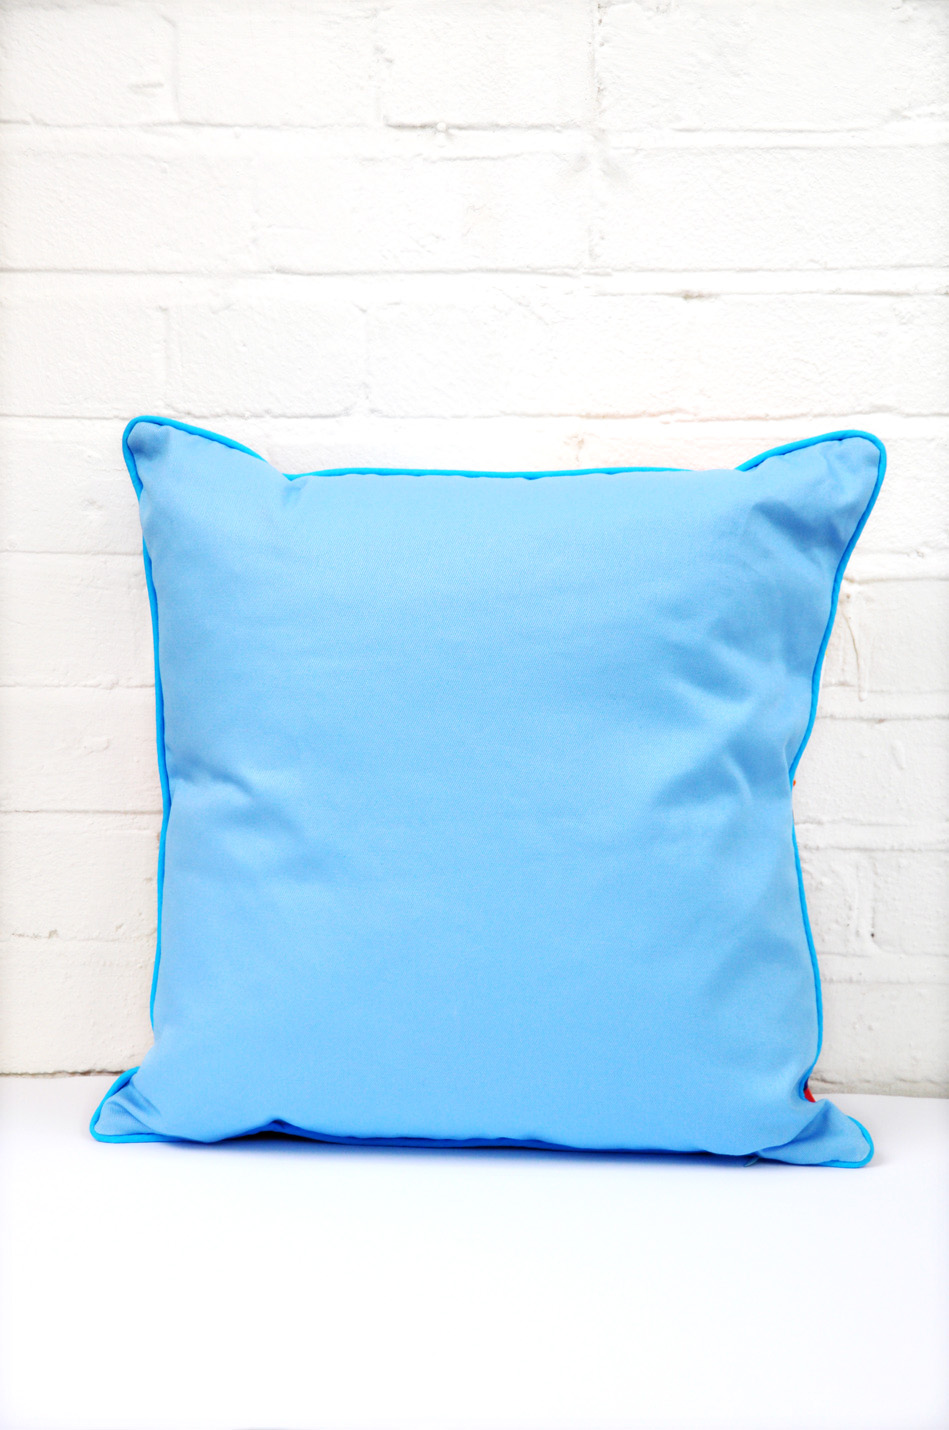 EmJay PrintPink&Turquoise-Blueback cushion.jpg